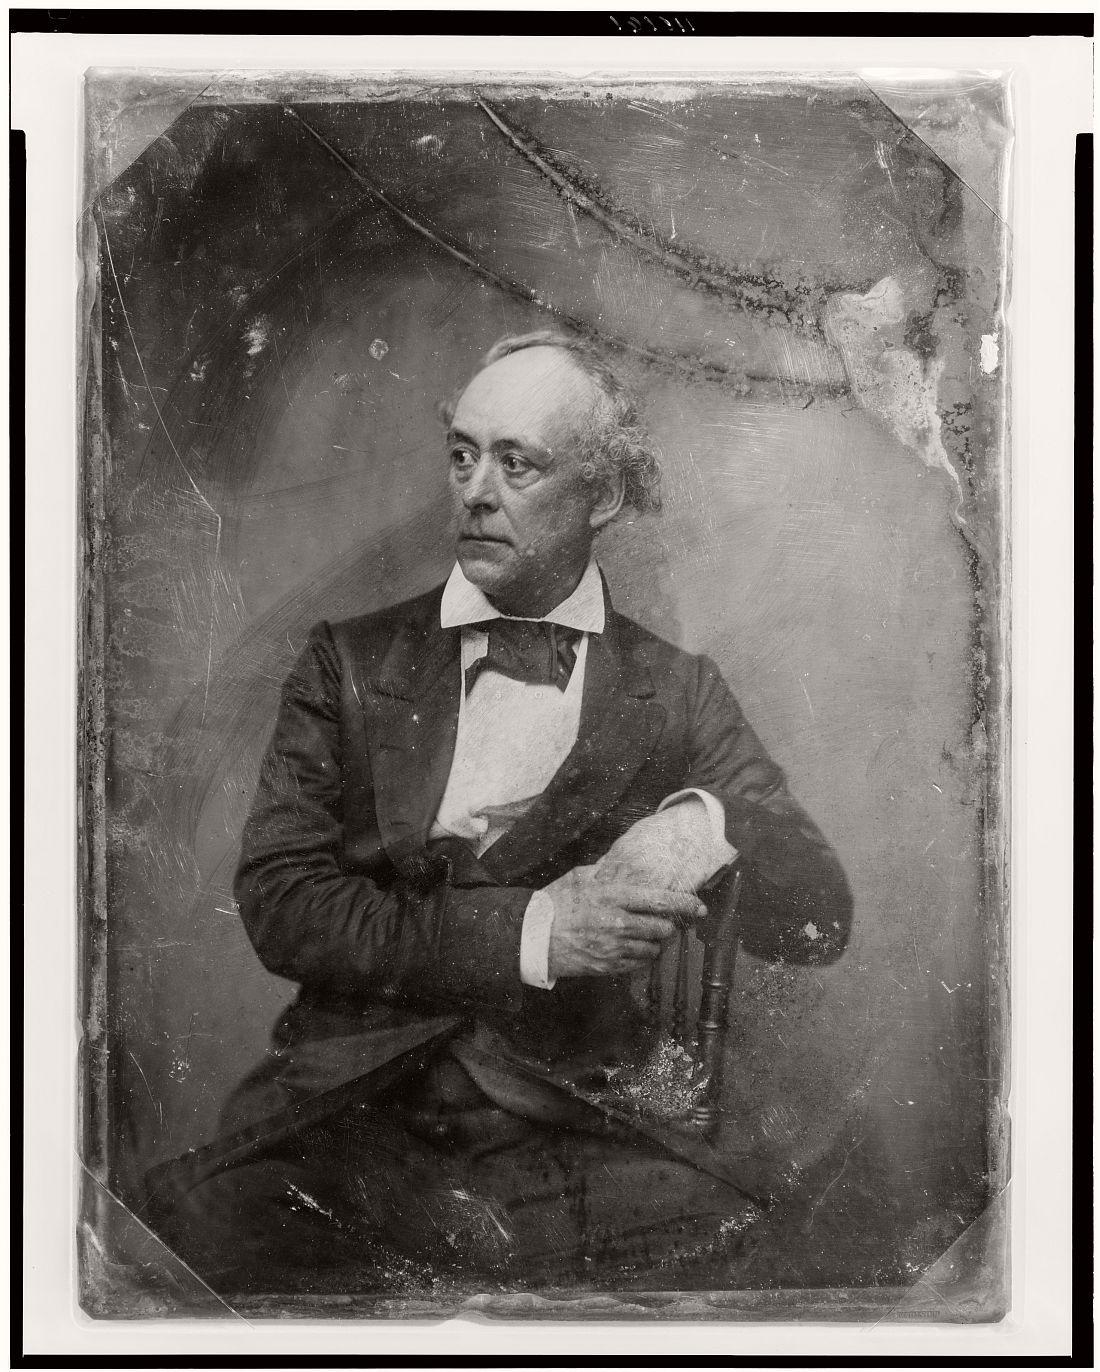 vintage-daguerreotype-portraits-from-xix-century-1844-1860-62